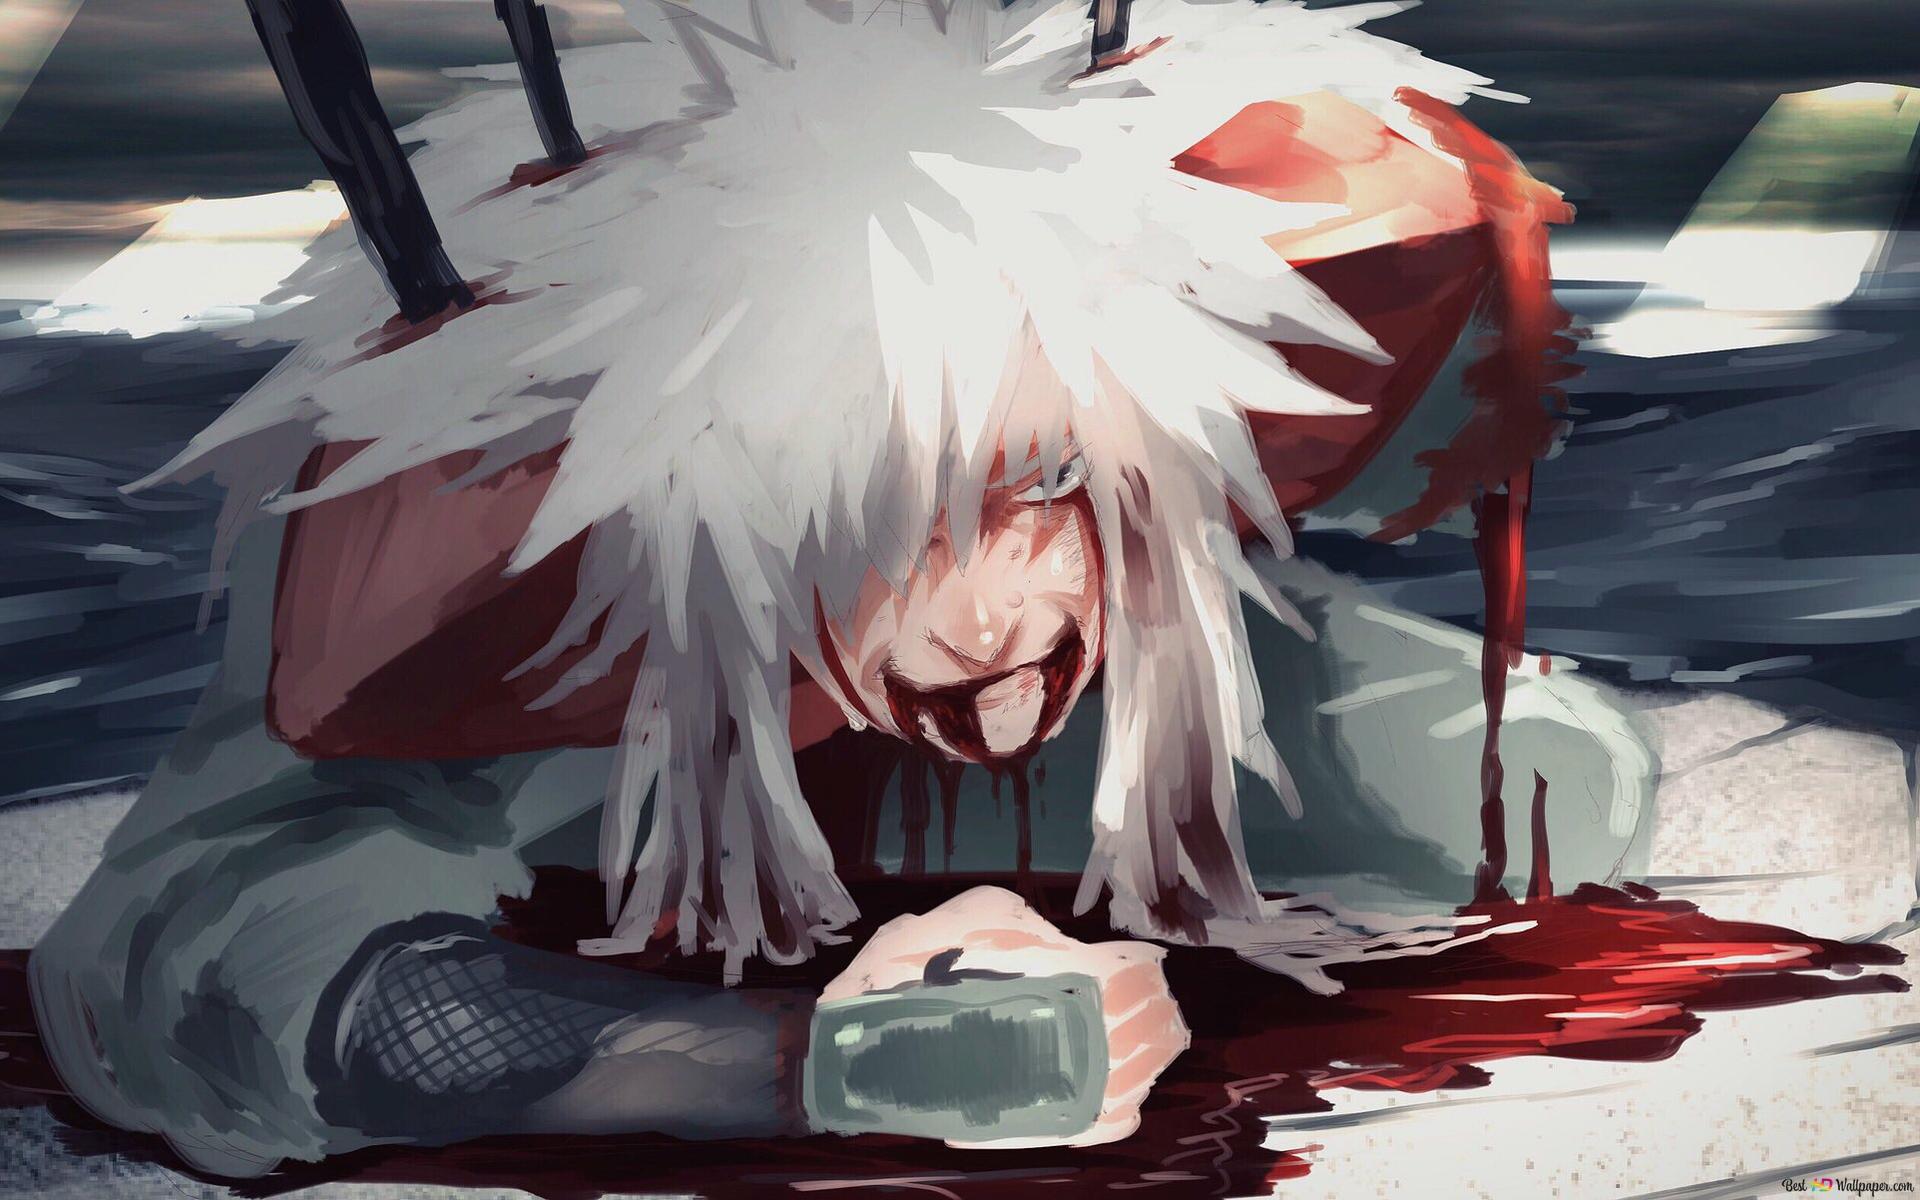 Descargar Fondo De Pantalla Naruto Shippuden Jiraiya Hd